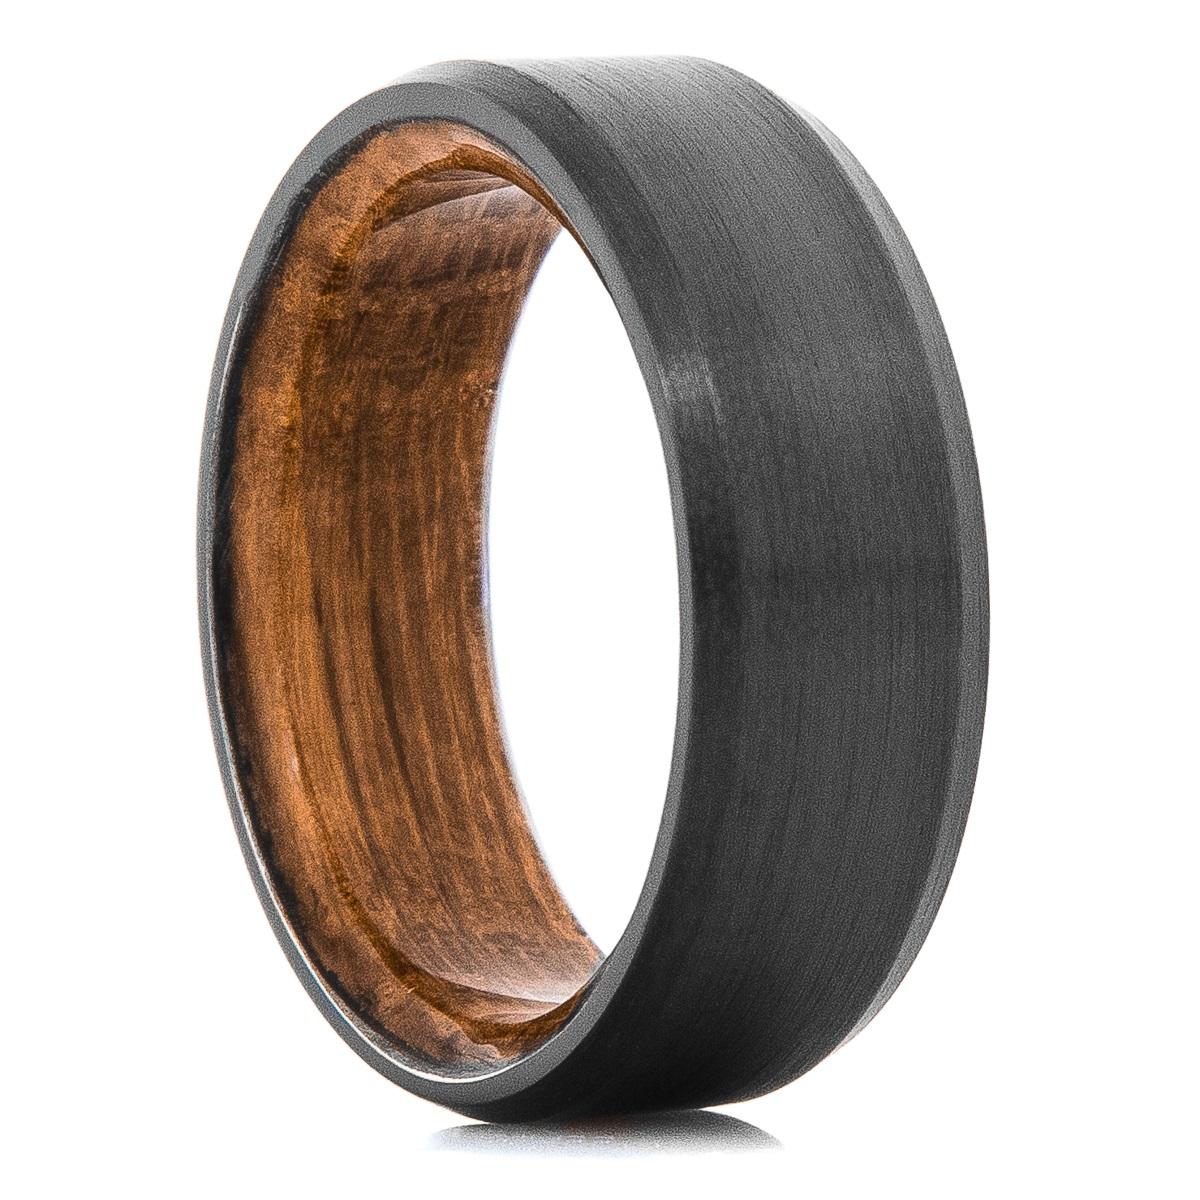 Men's Black Zirconium Ring with Whiskey Barrel Sleeve